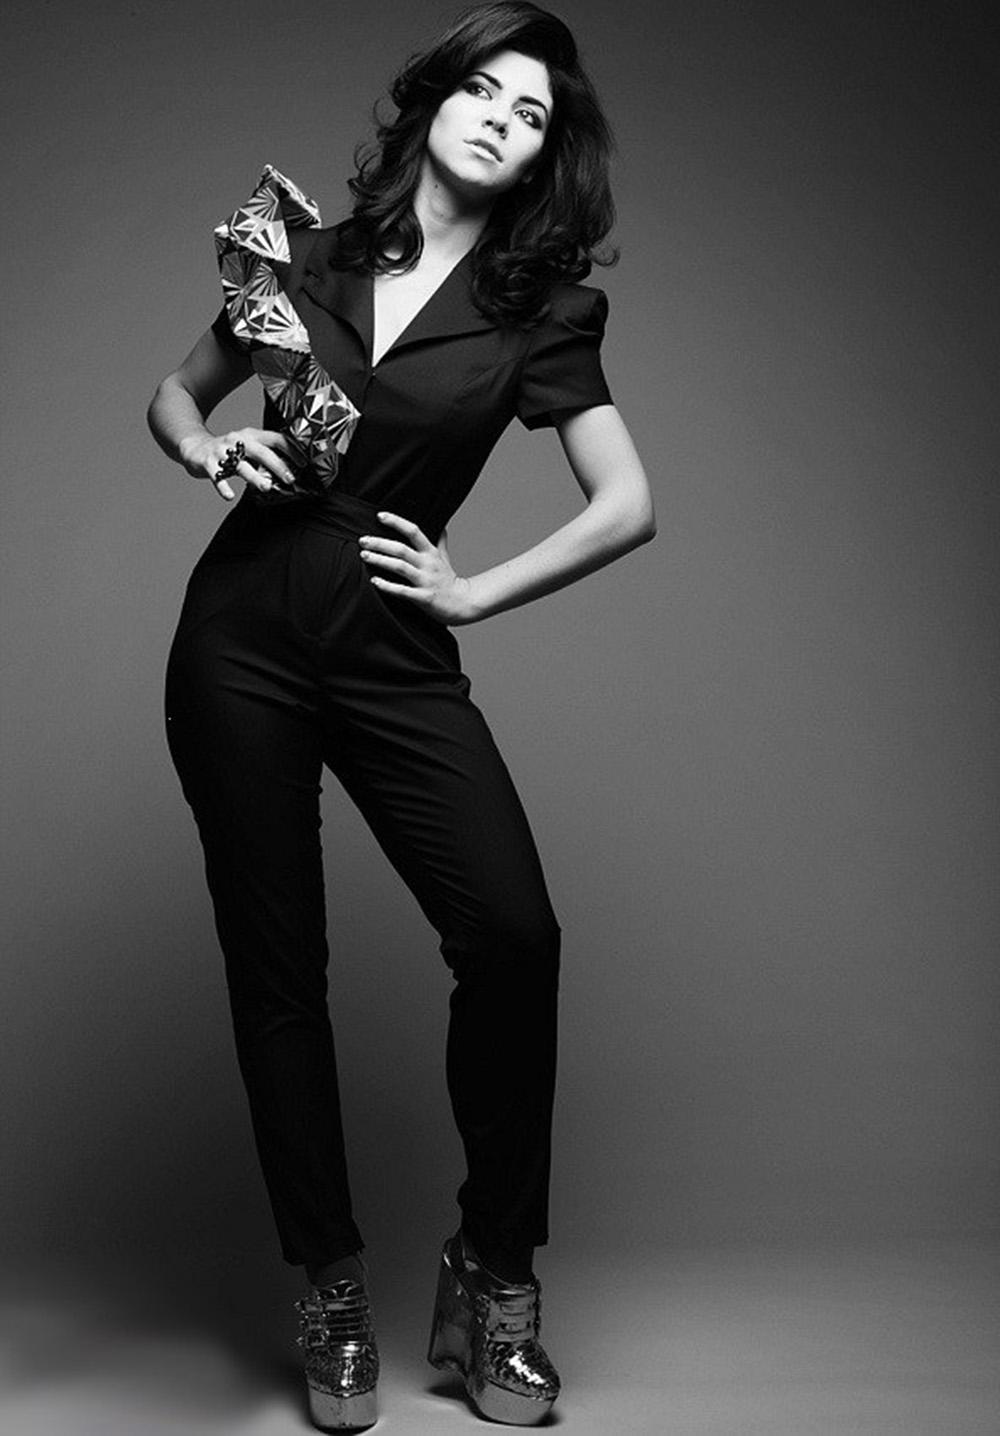 Marina and the diamonds 2013 album